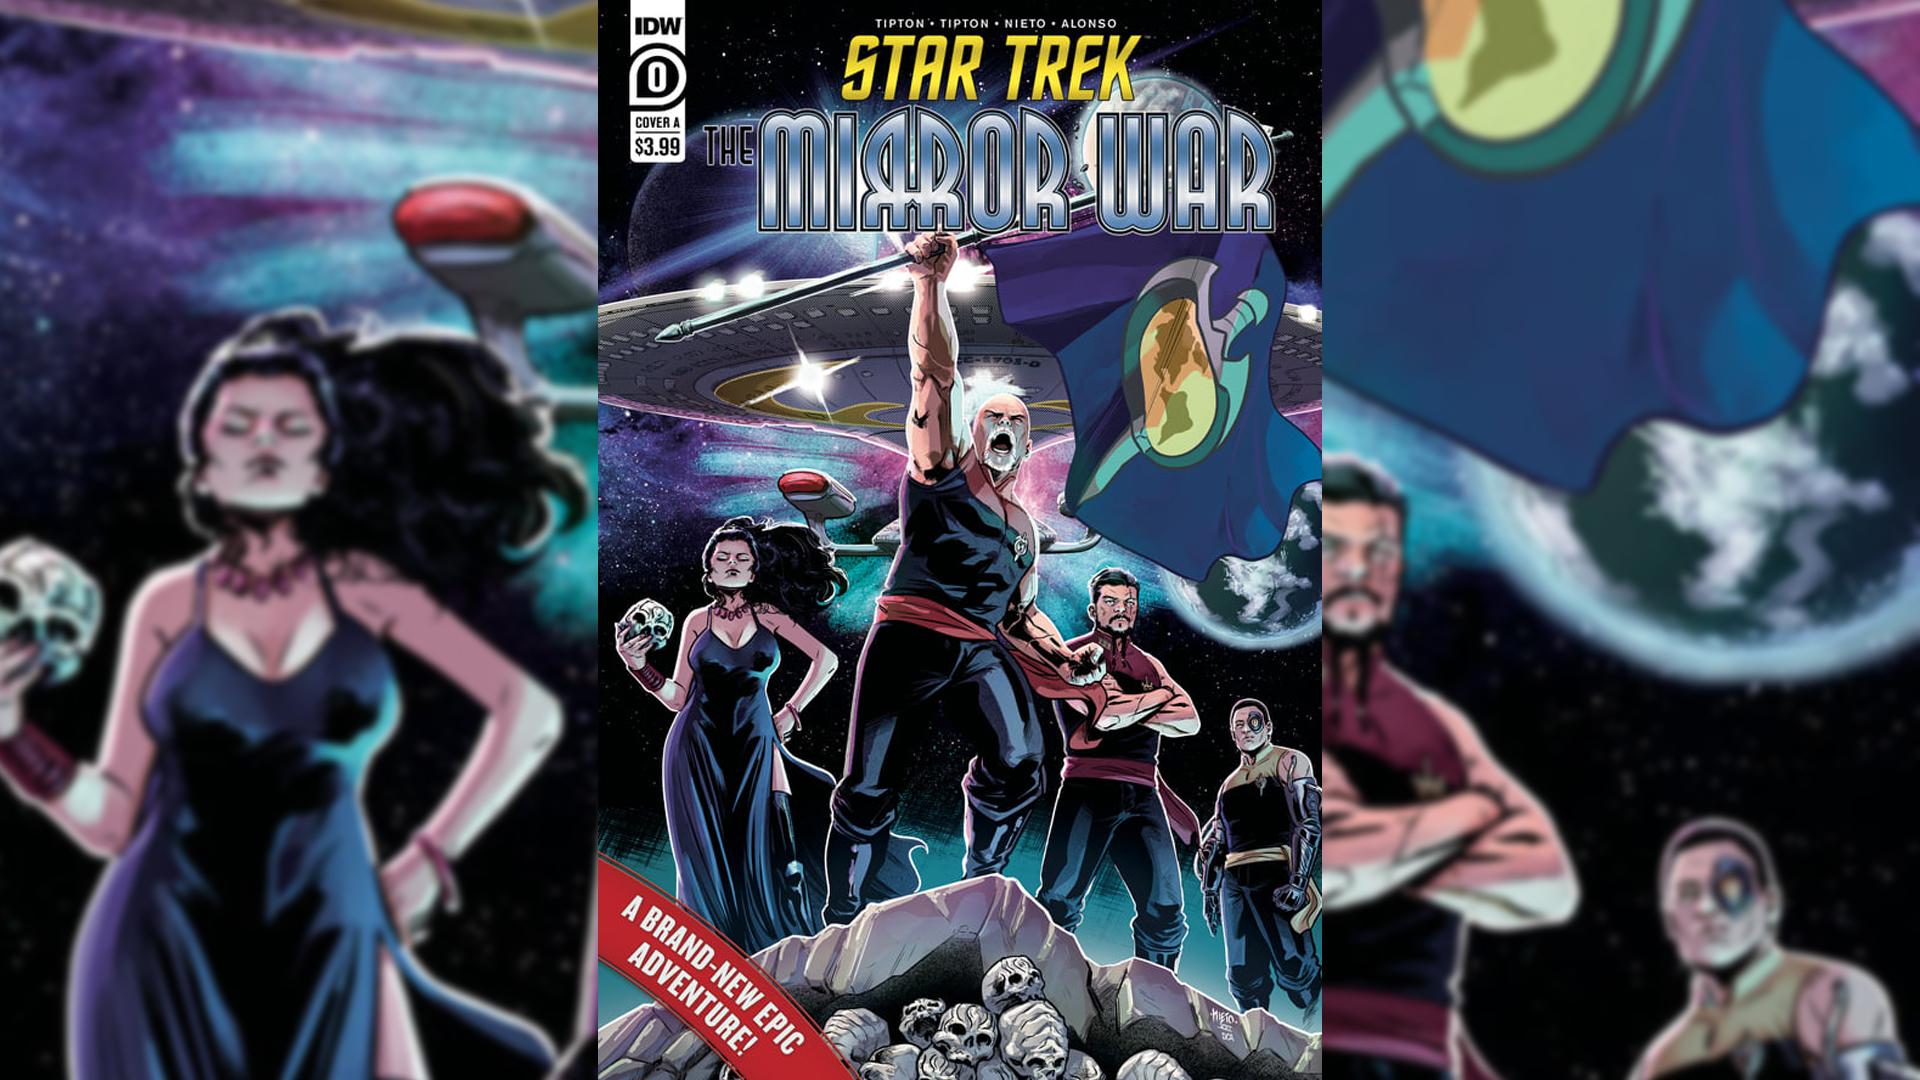 Star Trek Returns to the Mirror Universe with The Mirror War